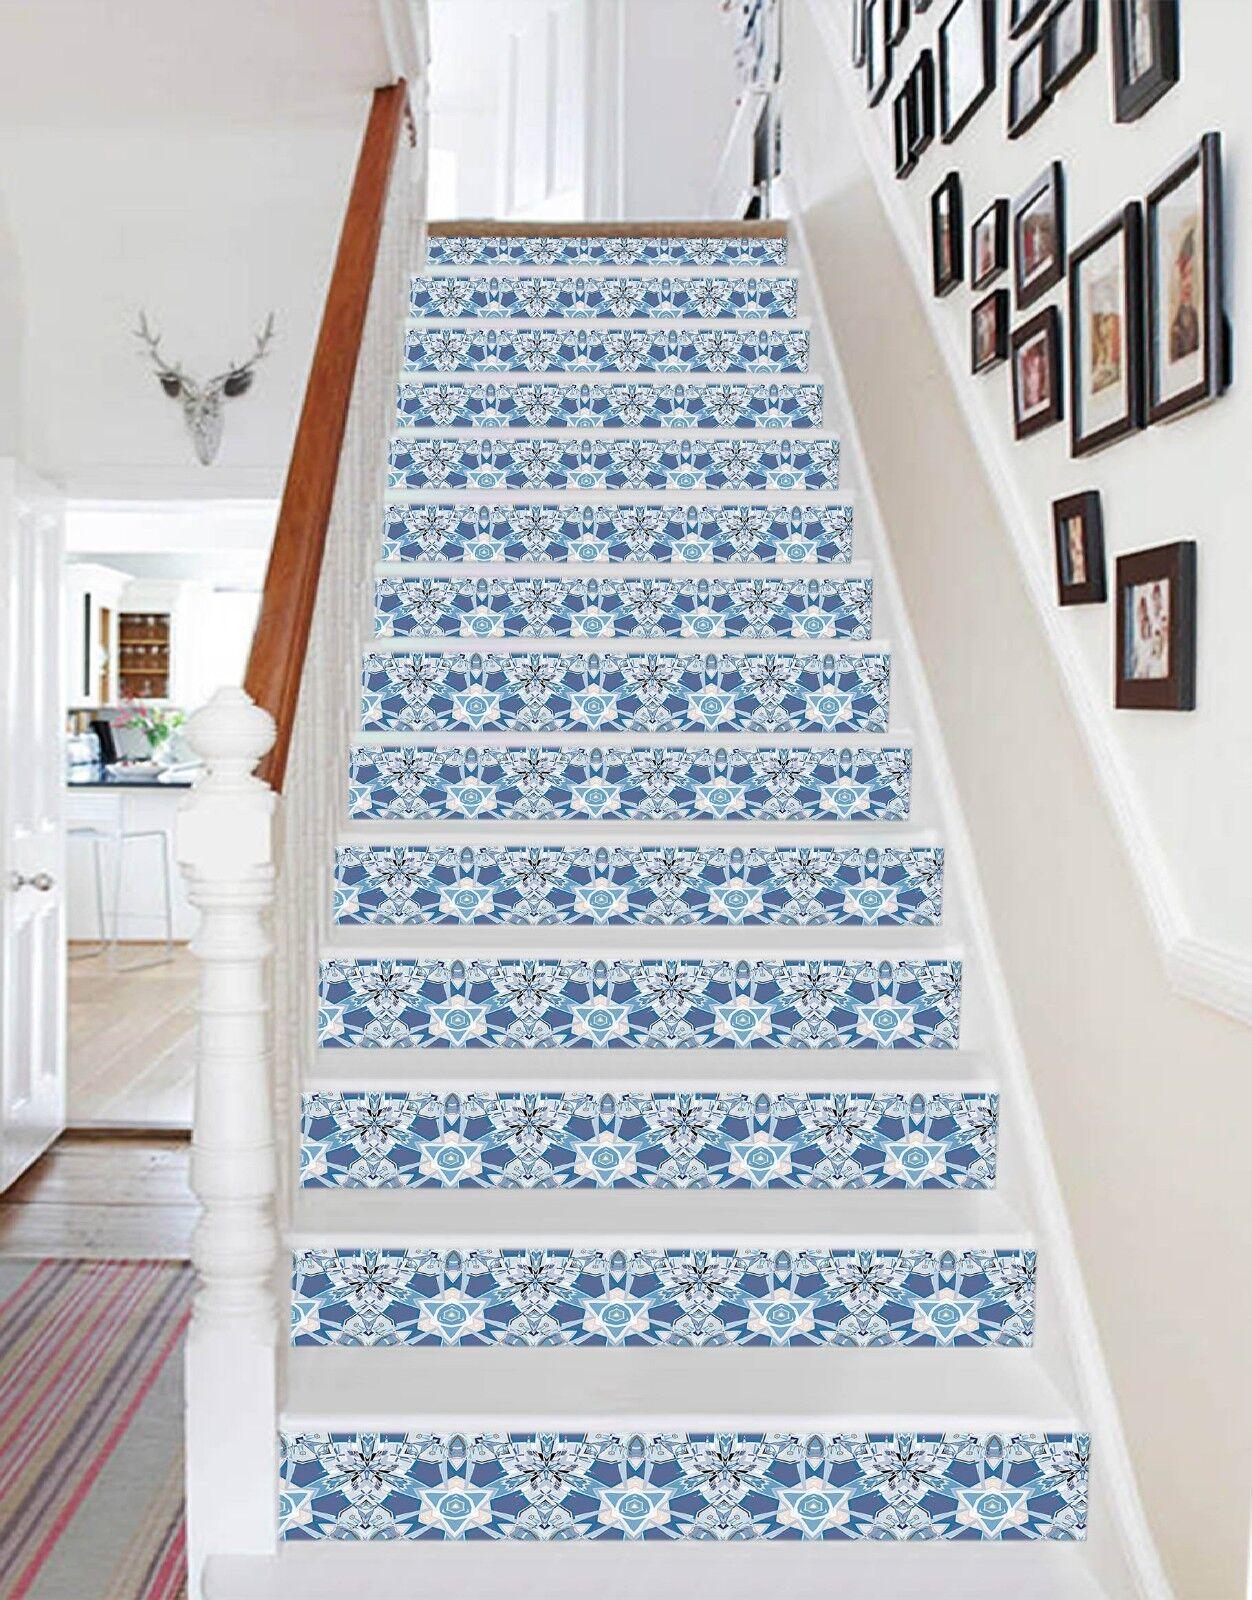 3D Fine Blau Leaves 1 Tile Marble Stair Risers Decoration Mural Vinyl WandPapier